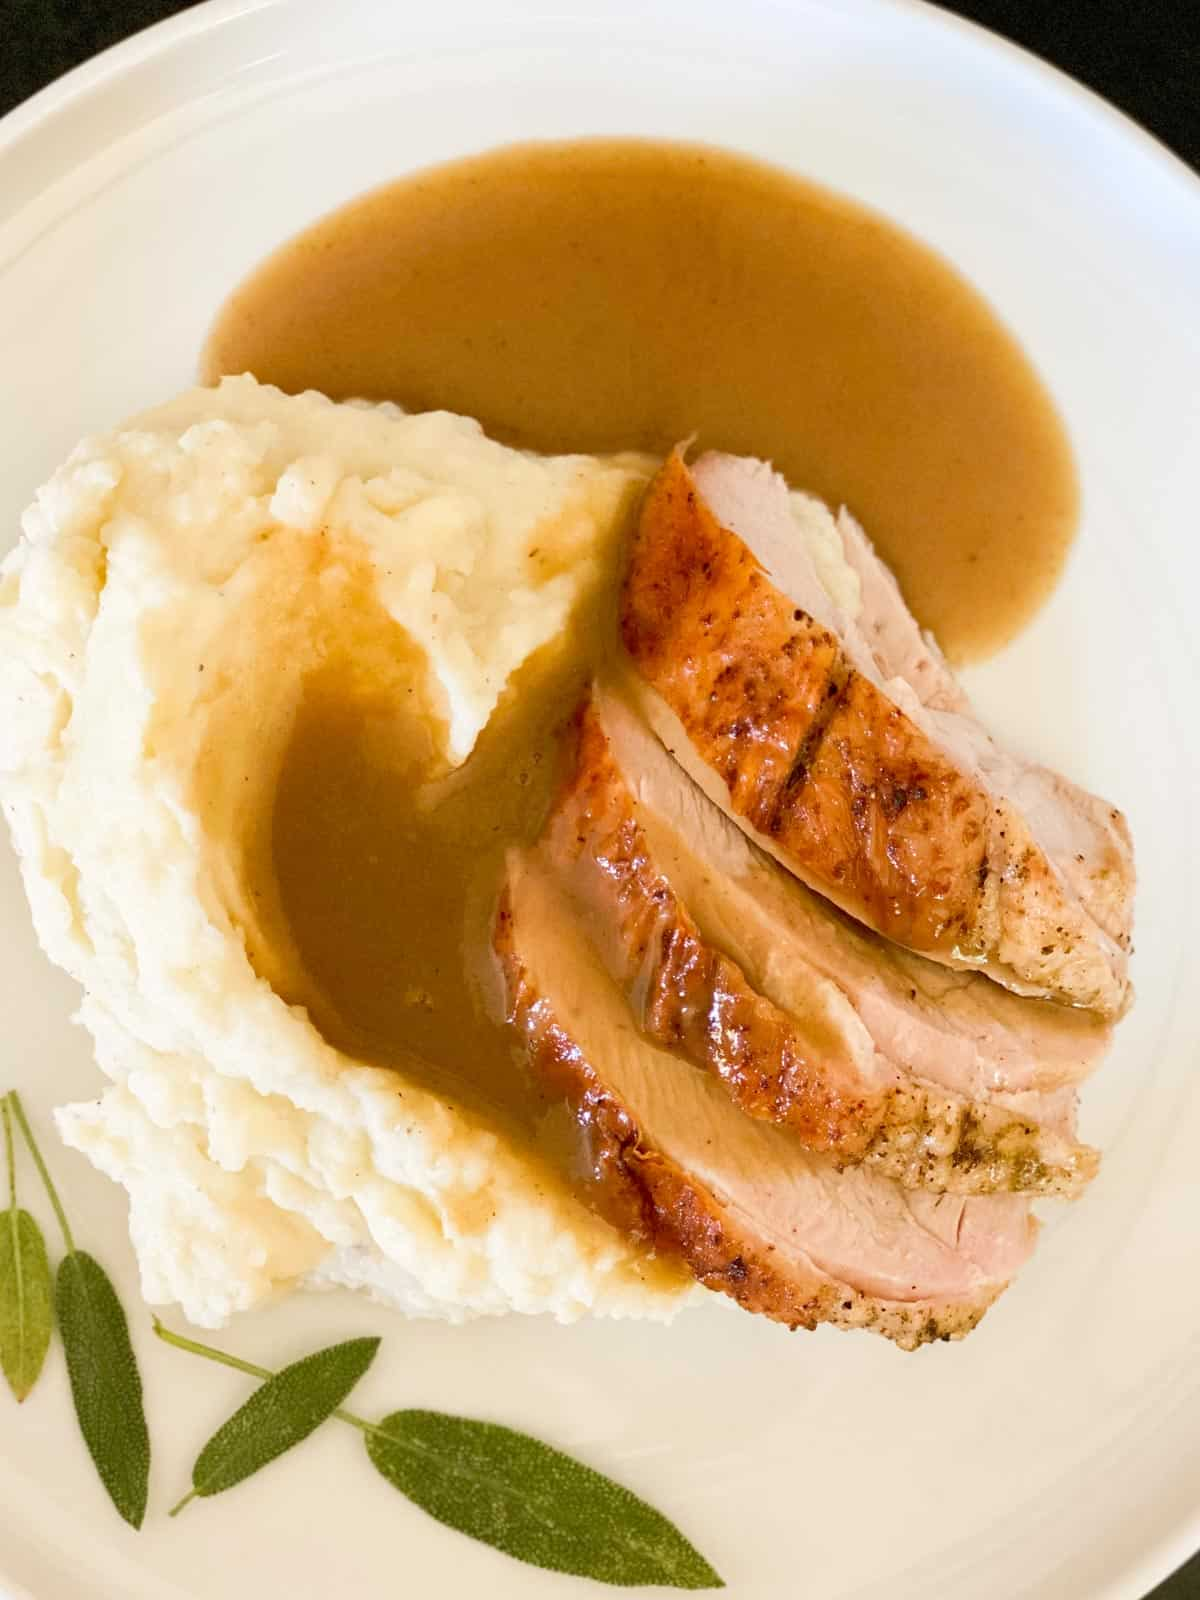 Turkey and homemade turkey gravy